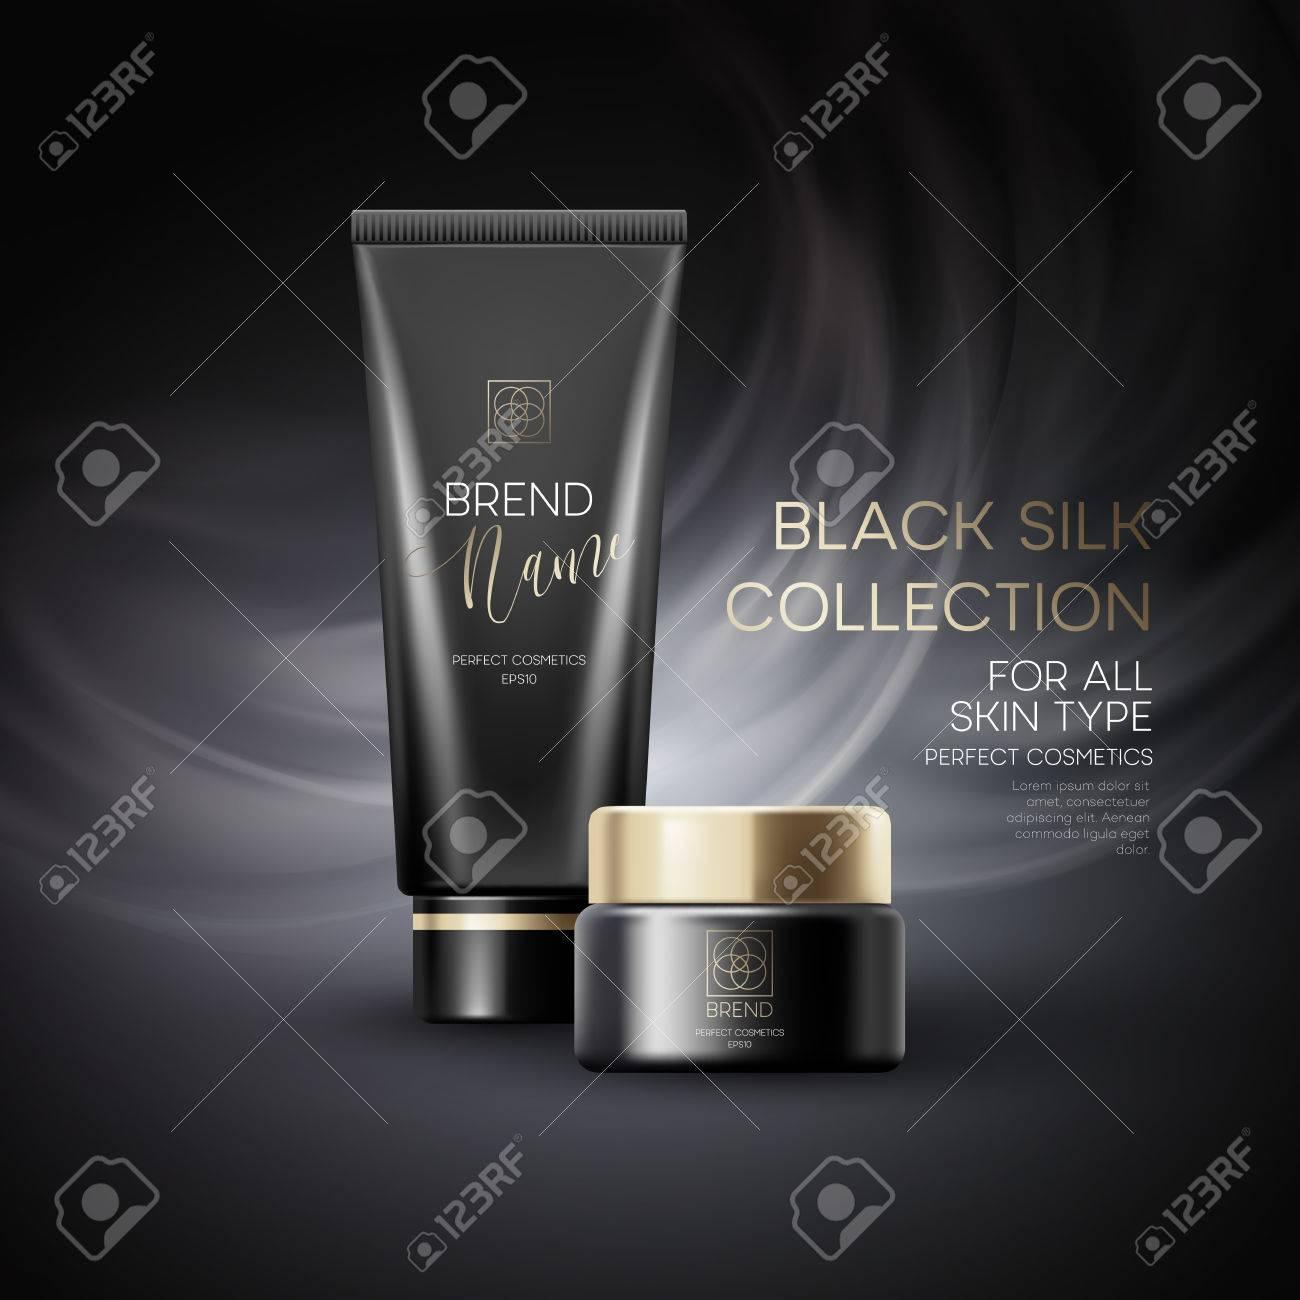 Design cosmetics product advertising on black background. Vector illustration - 69478528